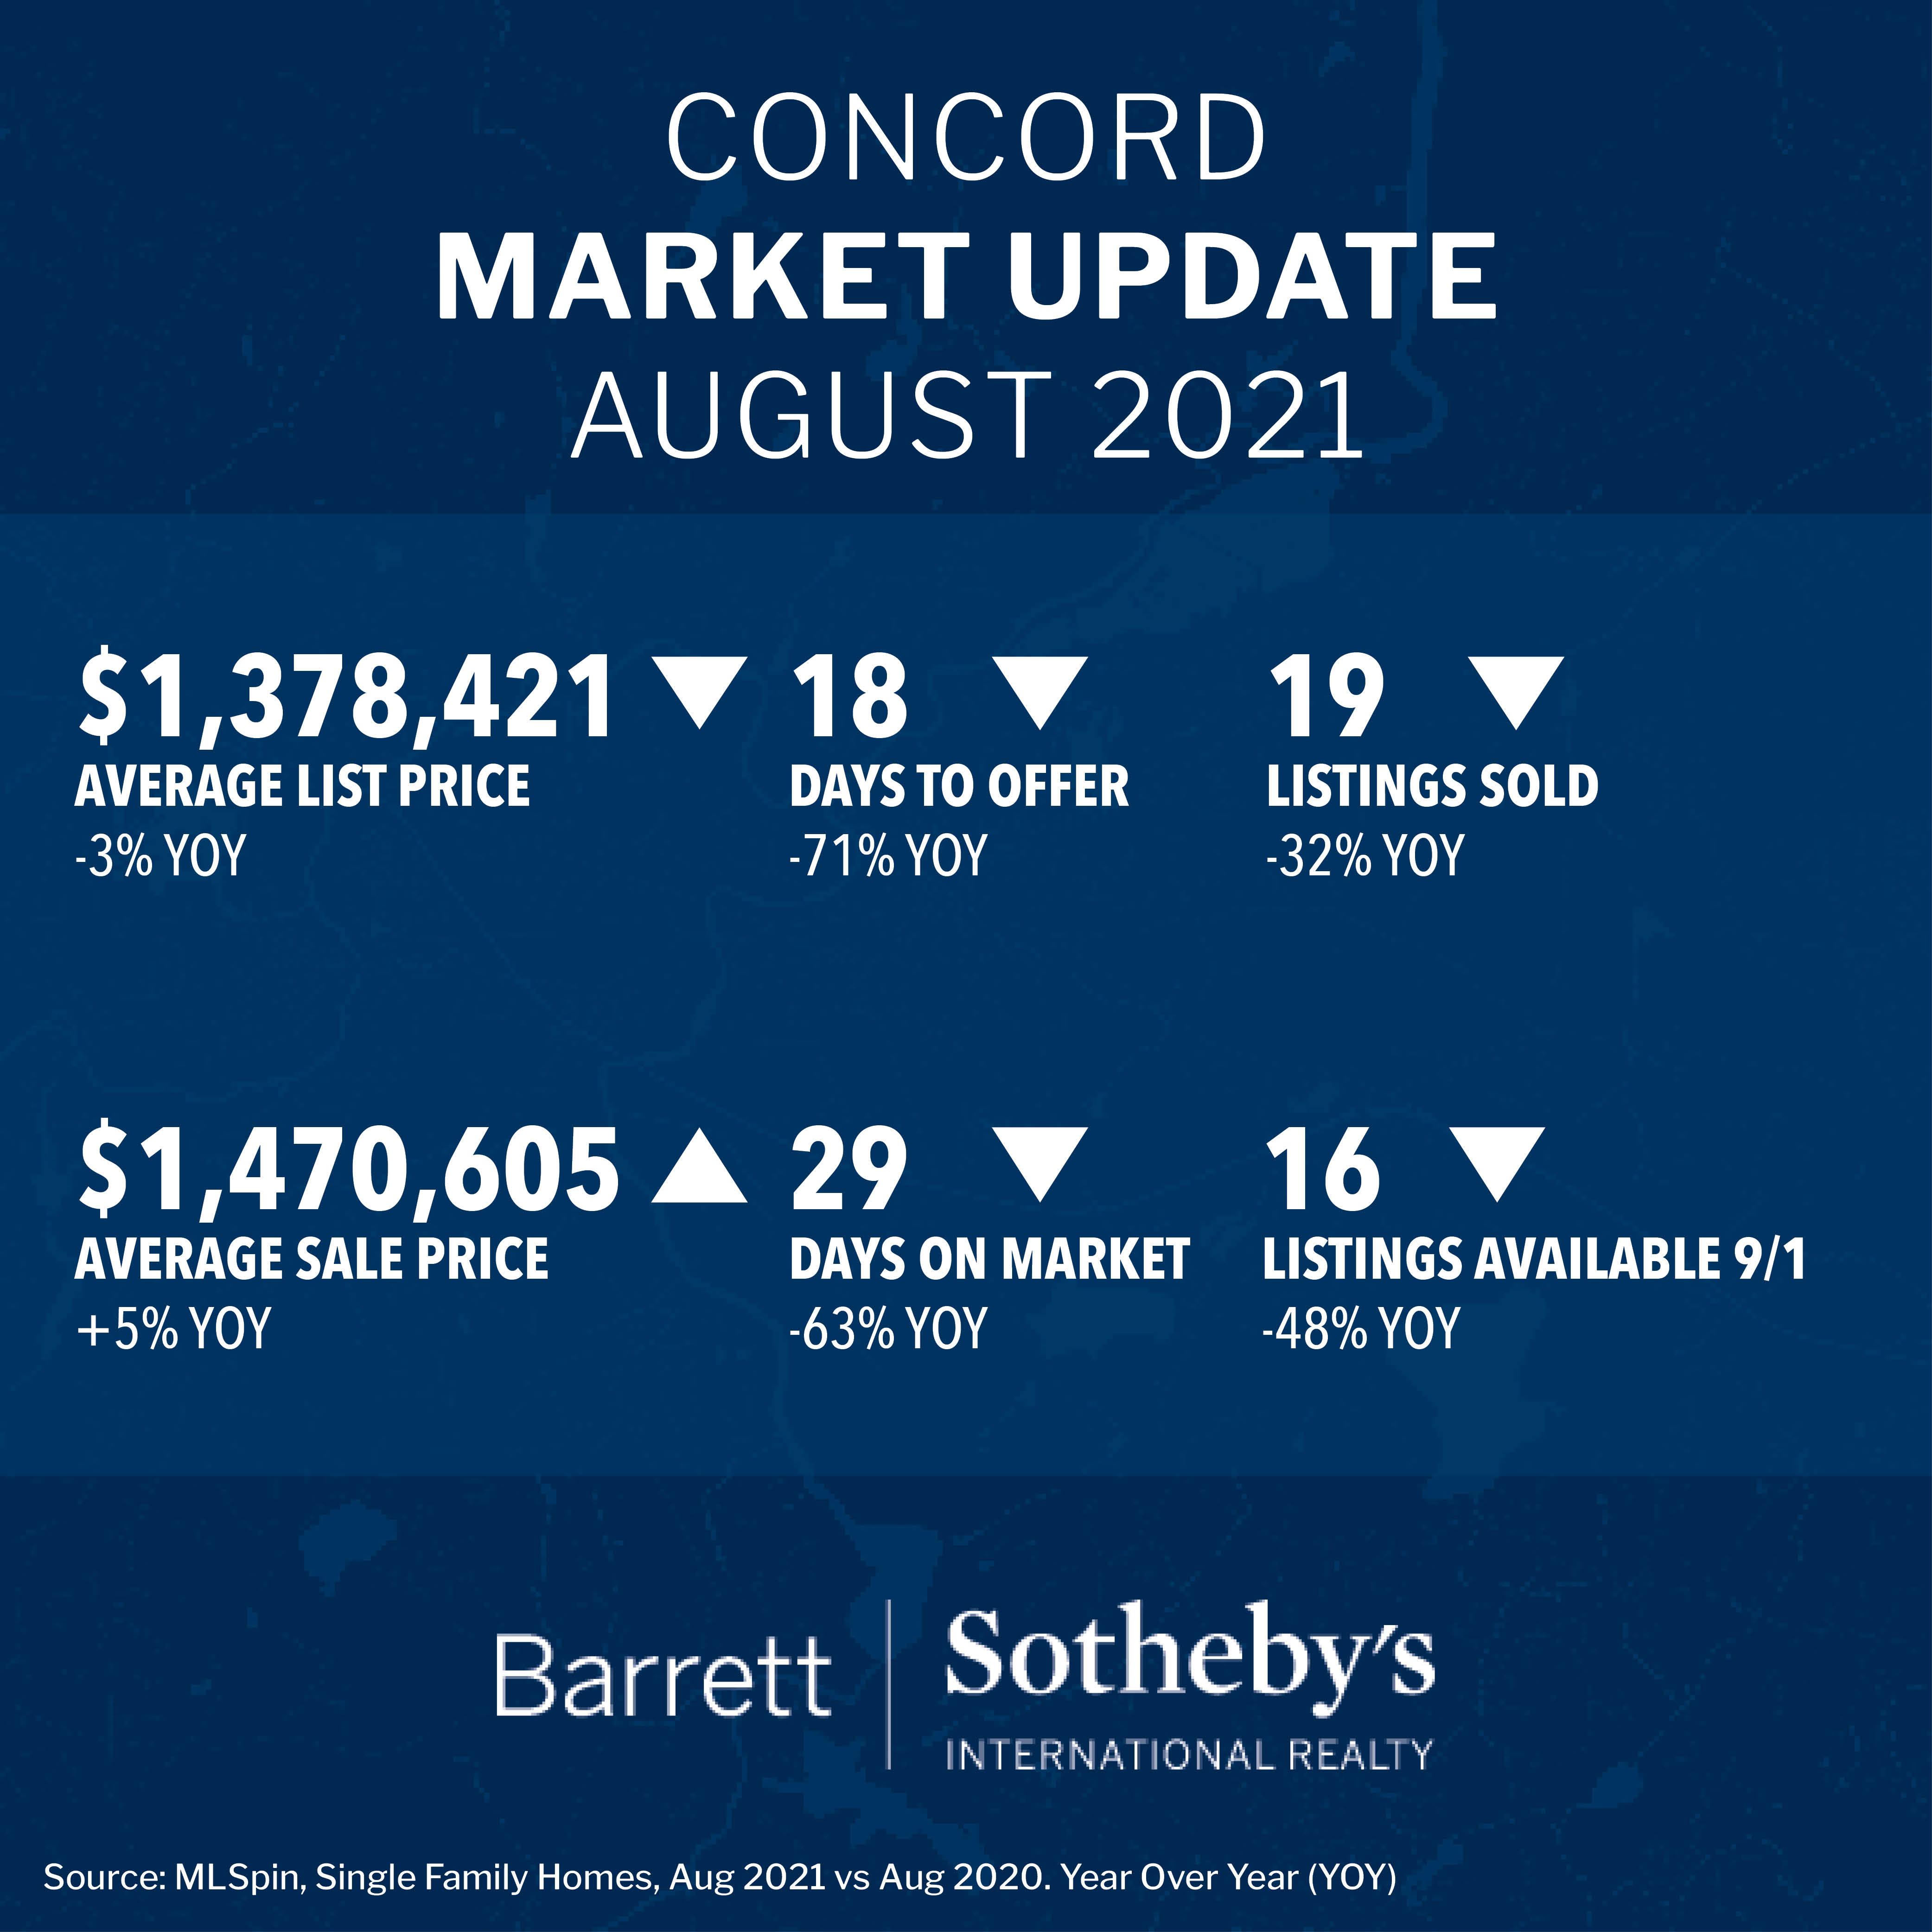 Concord Market Update August 2021